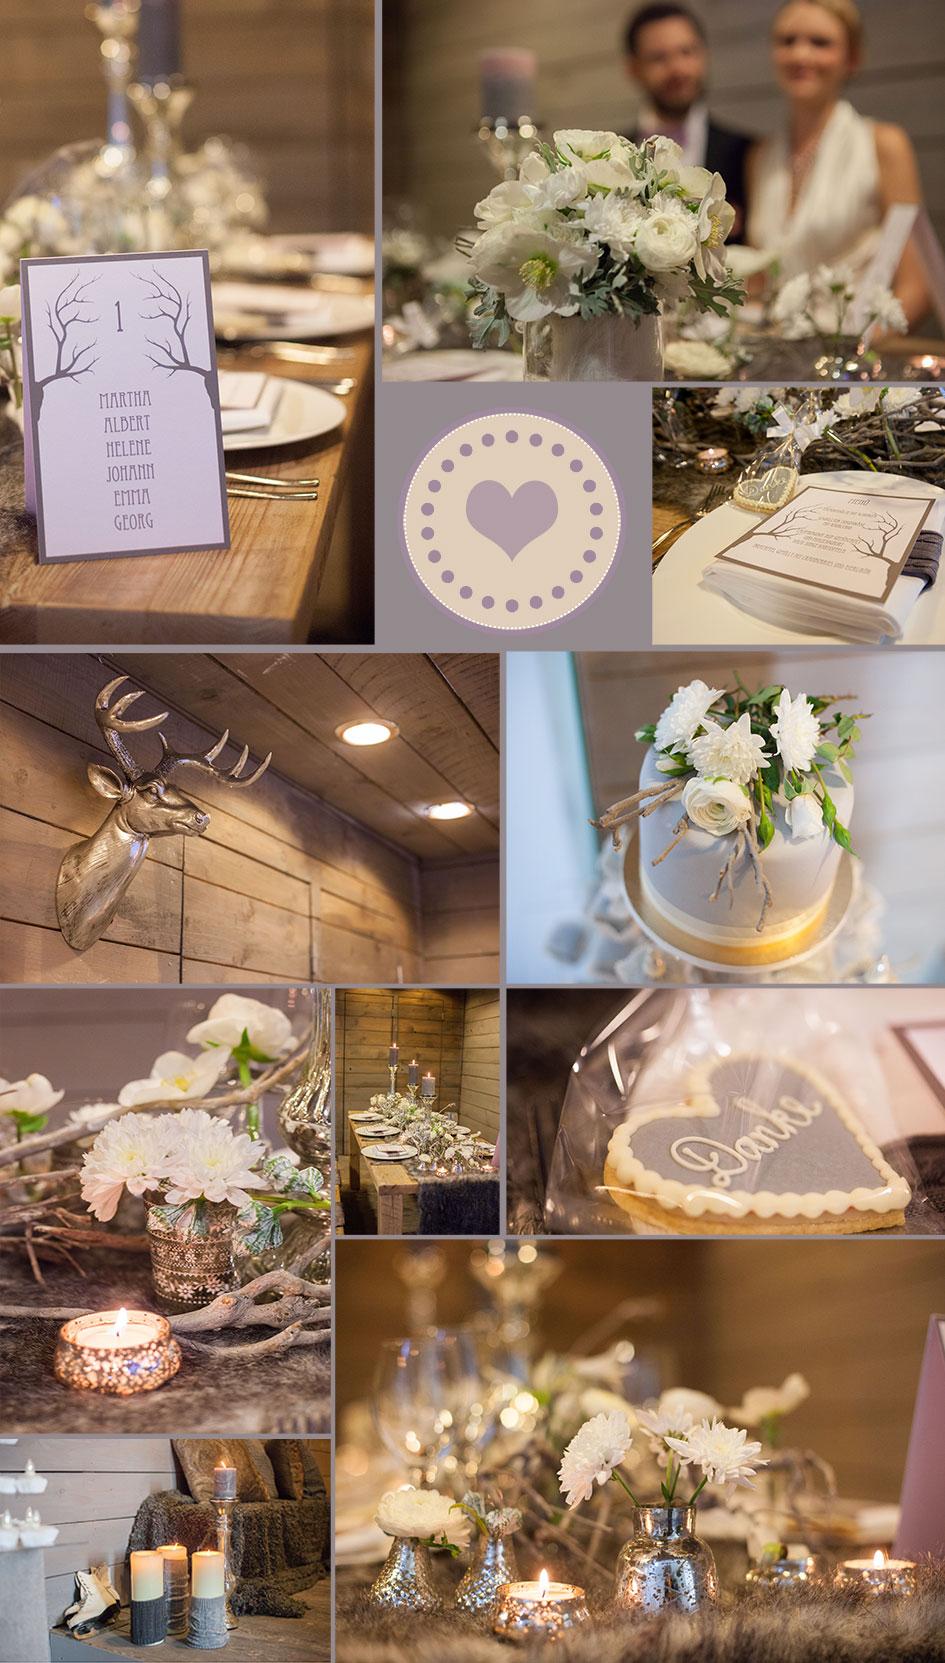 Moodboard for a romantical winter wedding